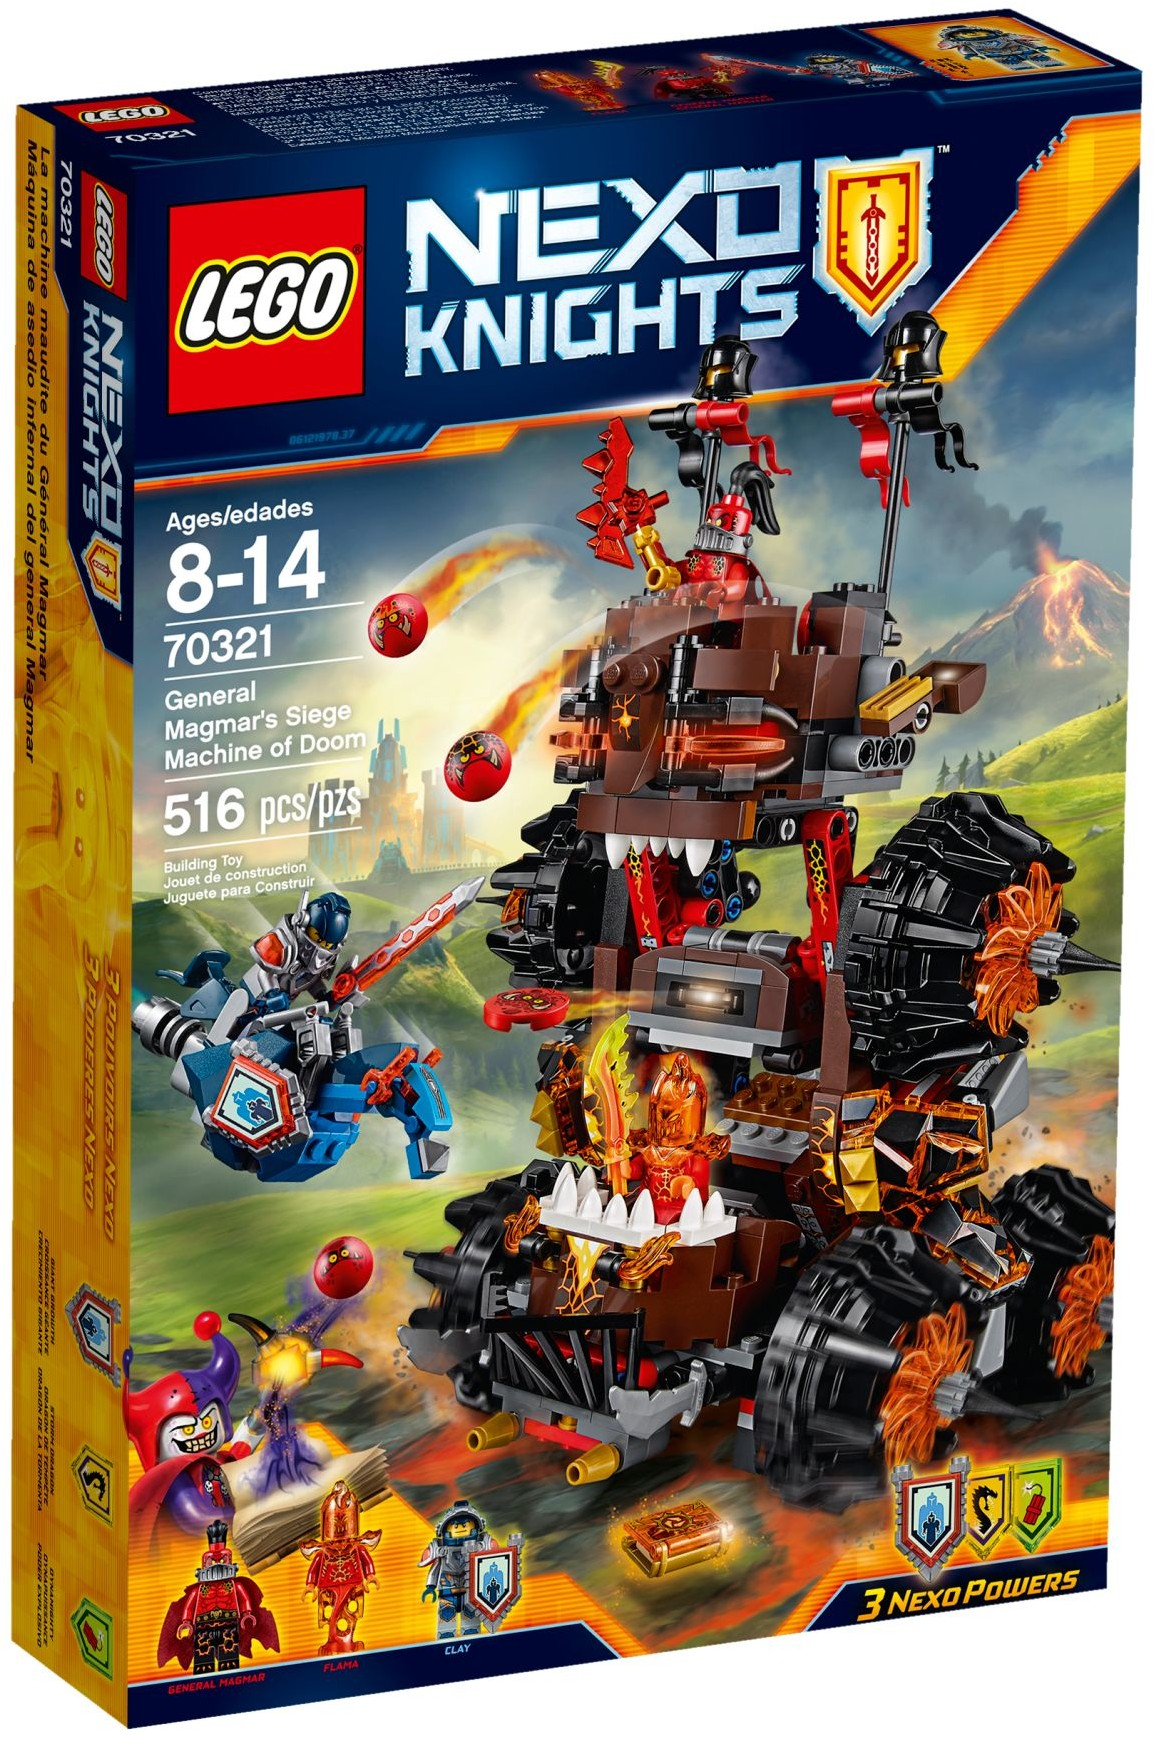 LEGO # 70321 NEXO KNIGHTS General Magmar's Siege Machine of Doom